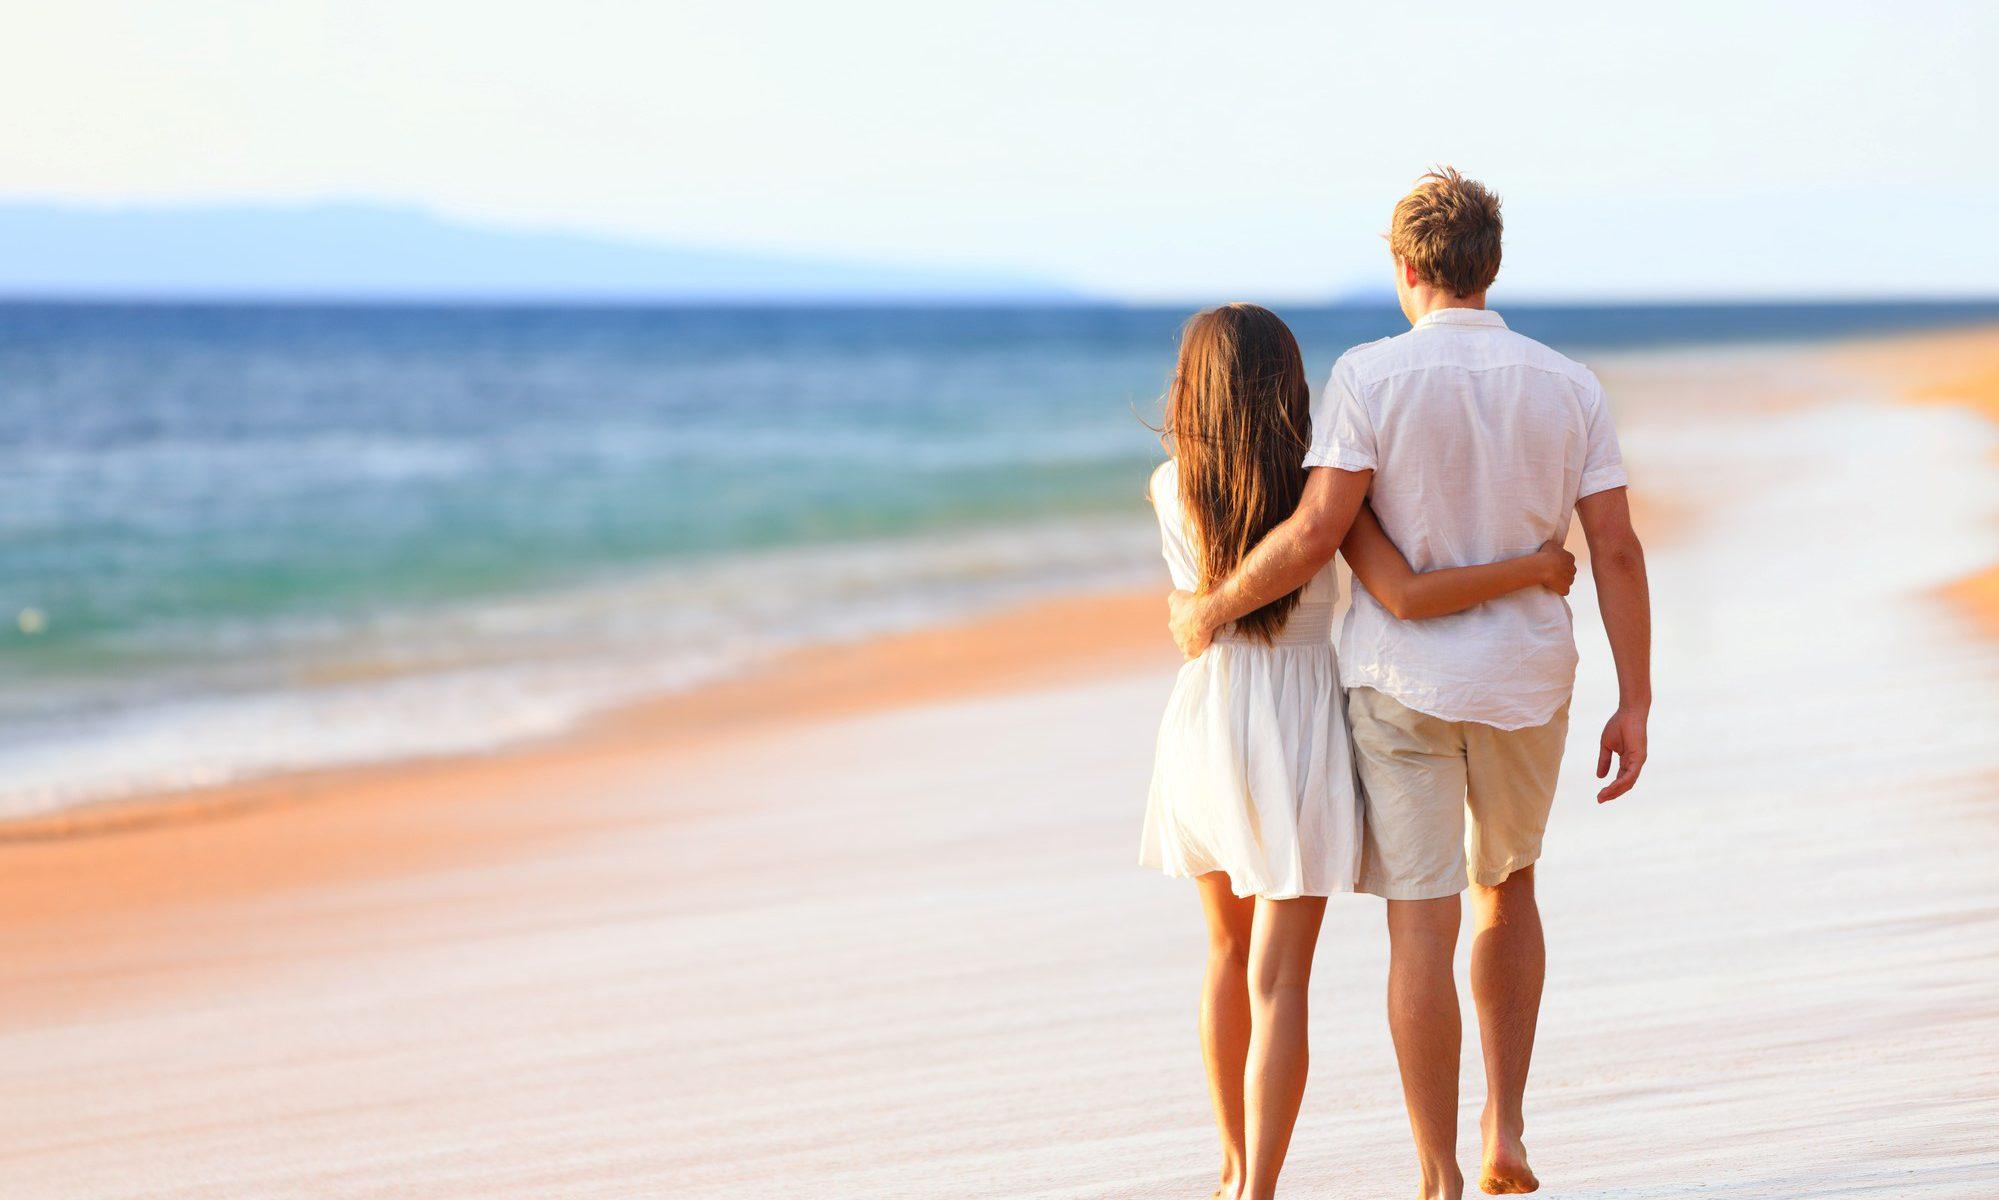 Beach couple walking on romantic travel